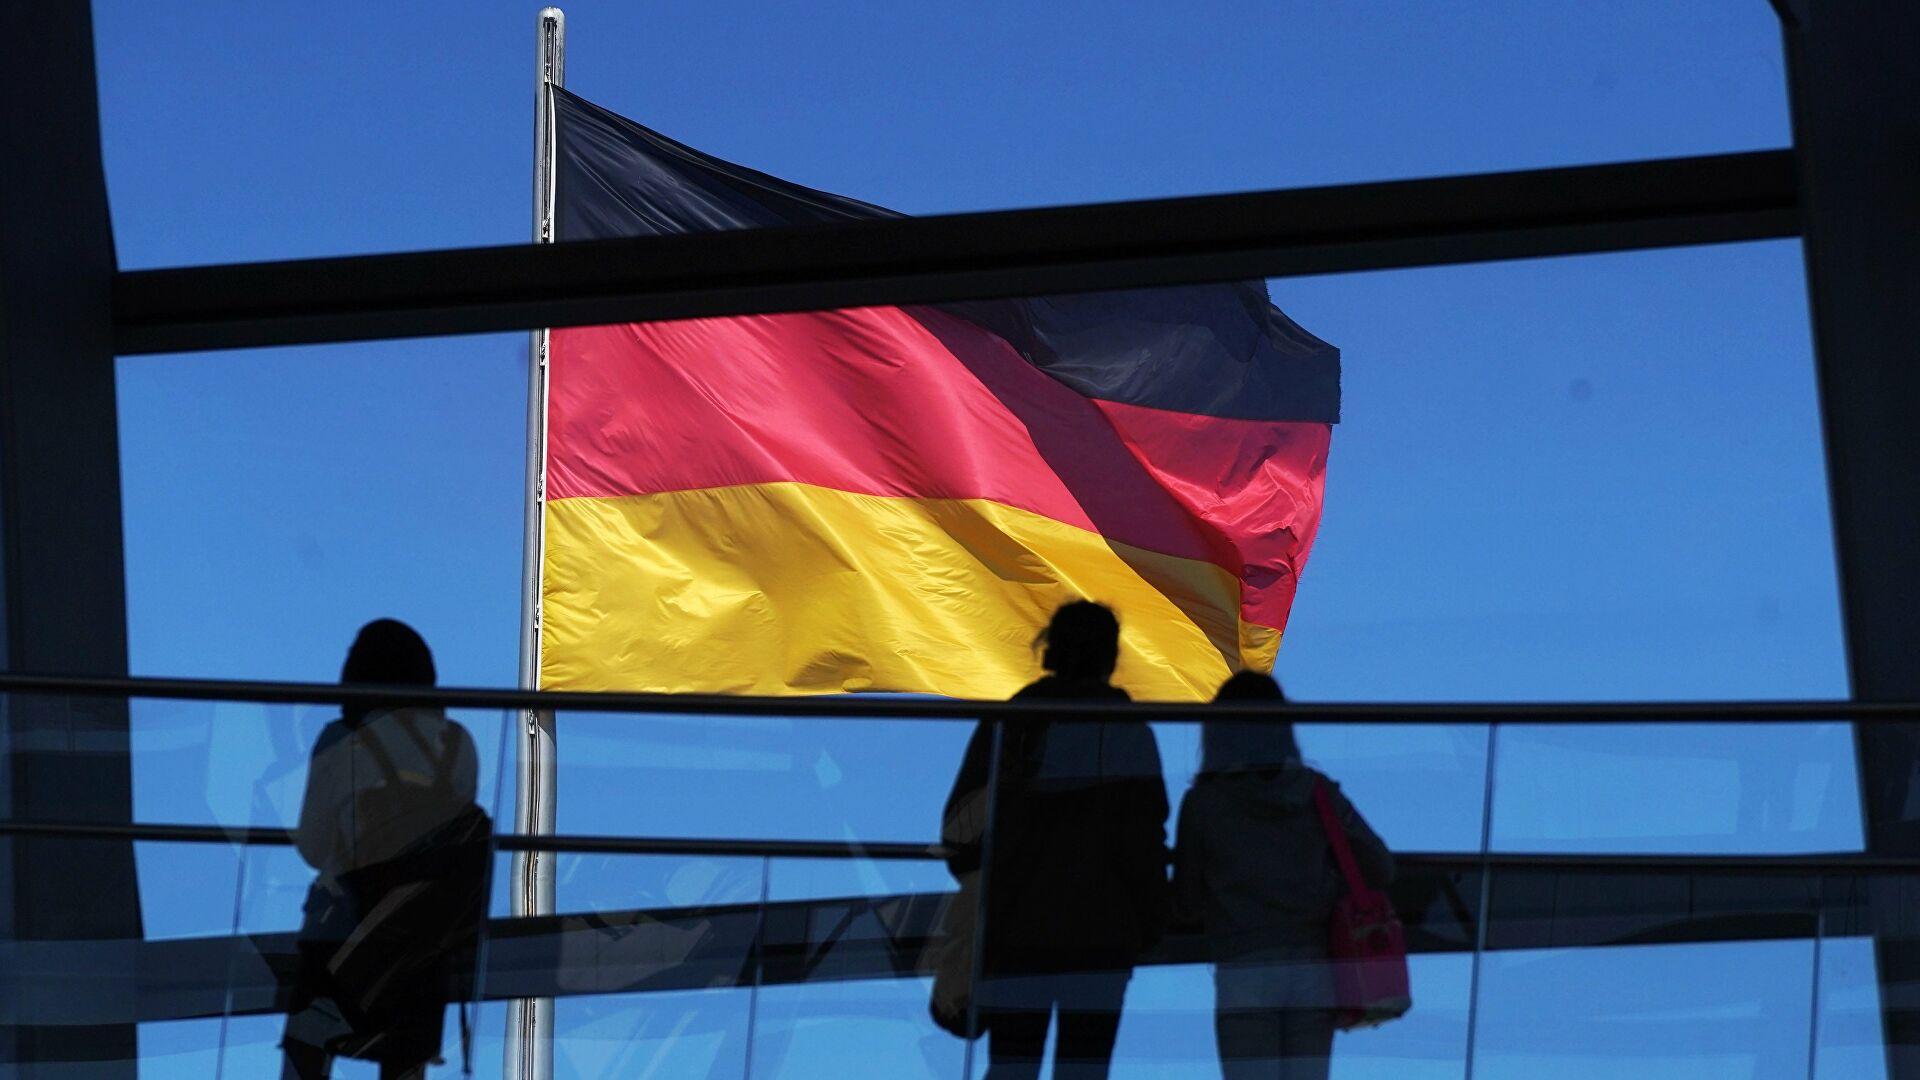 Nemačka: Sankcije Rusije protiv Nemačke i Francuske neopravdane i neprimerene